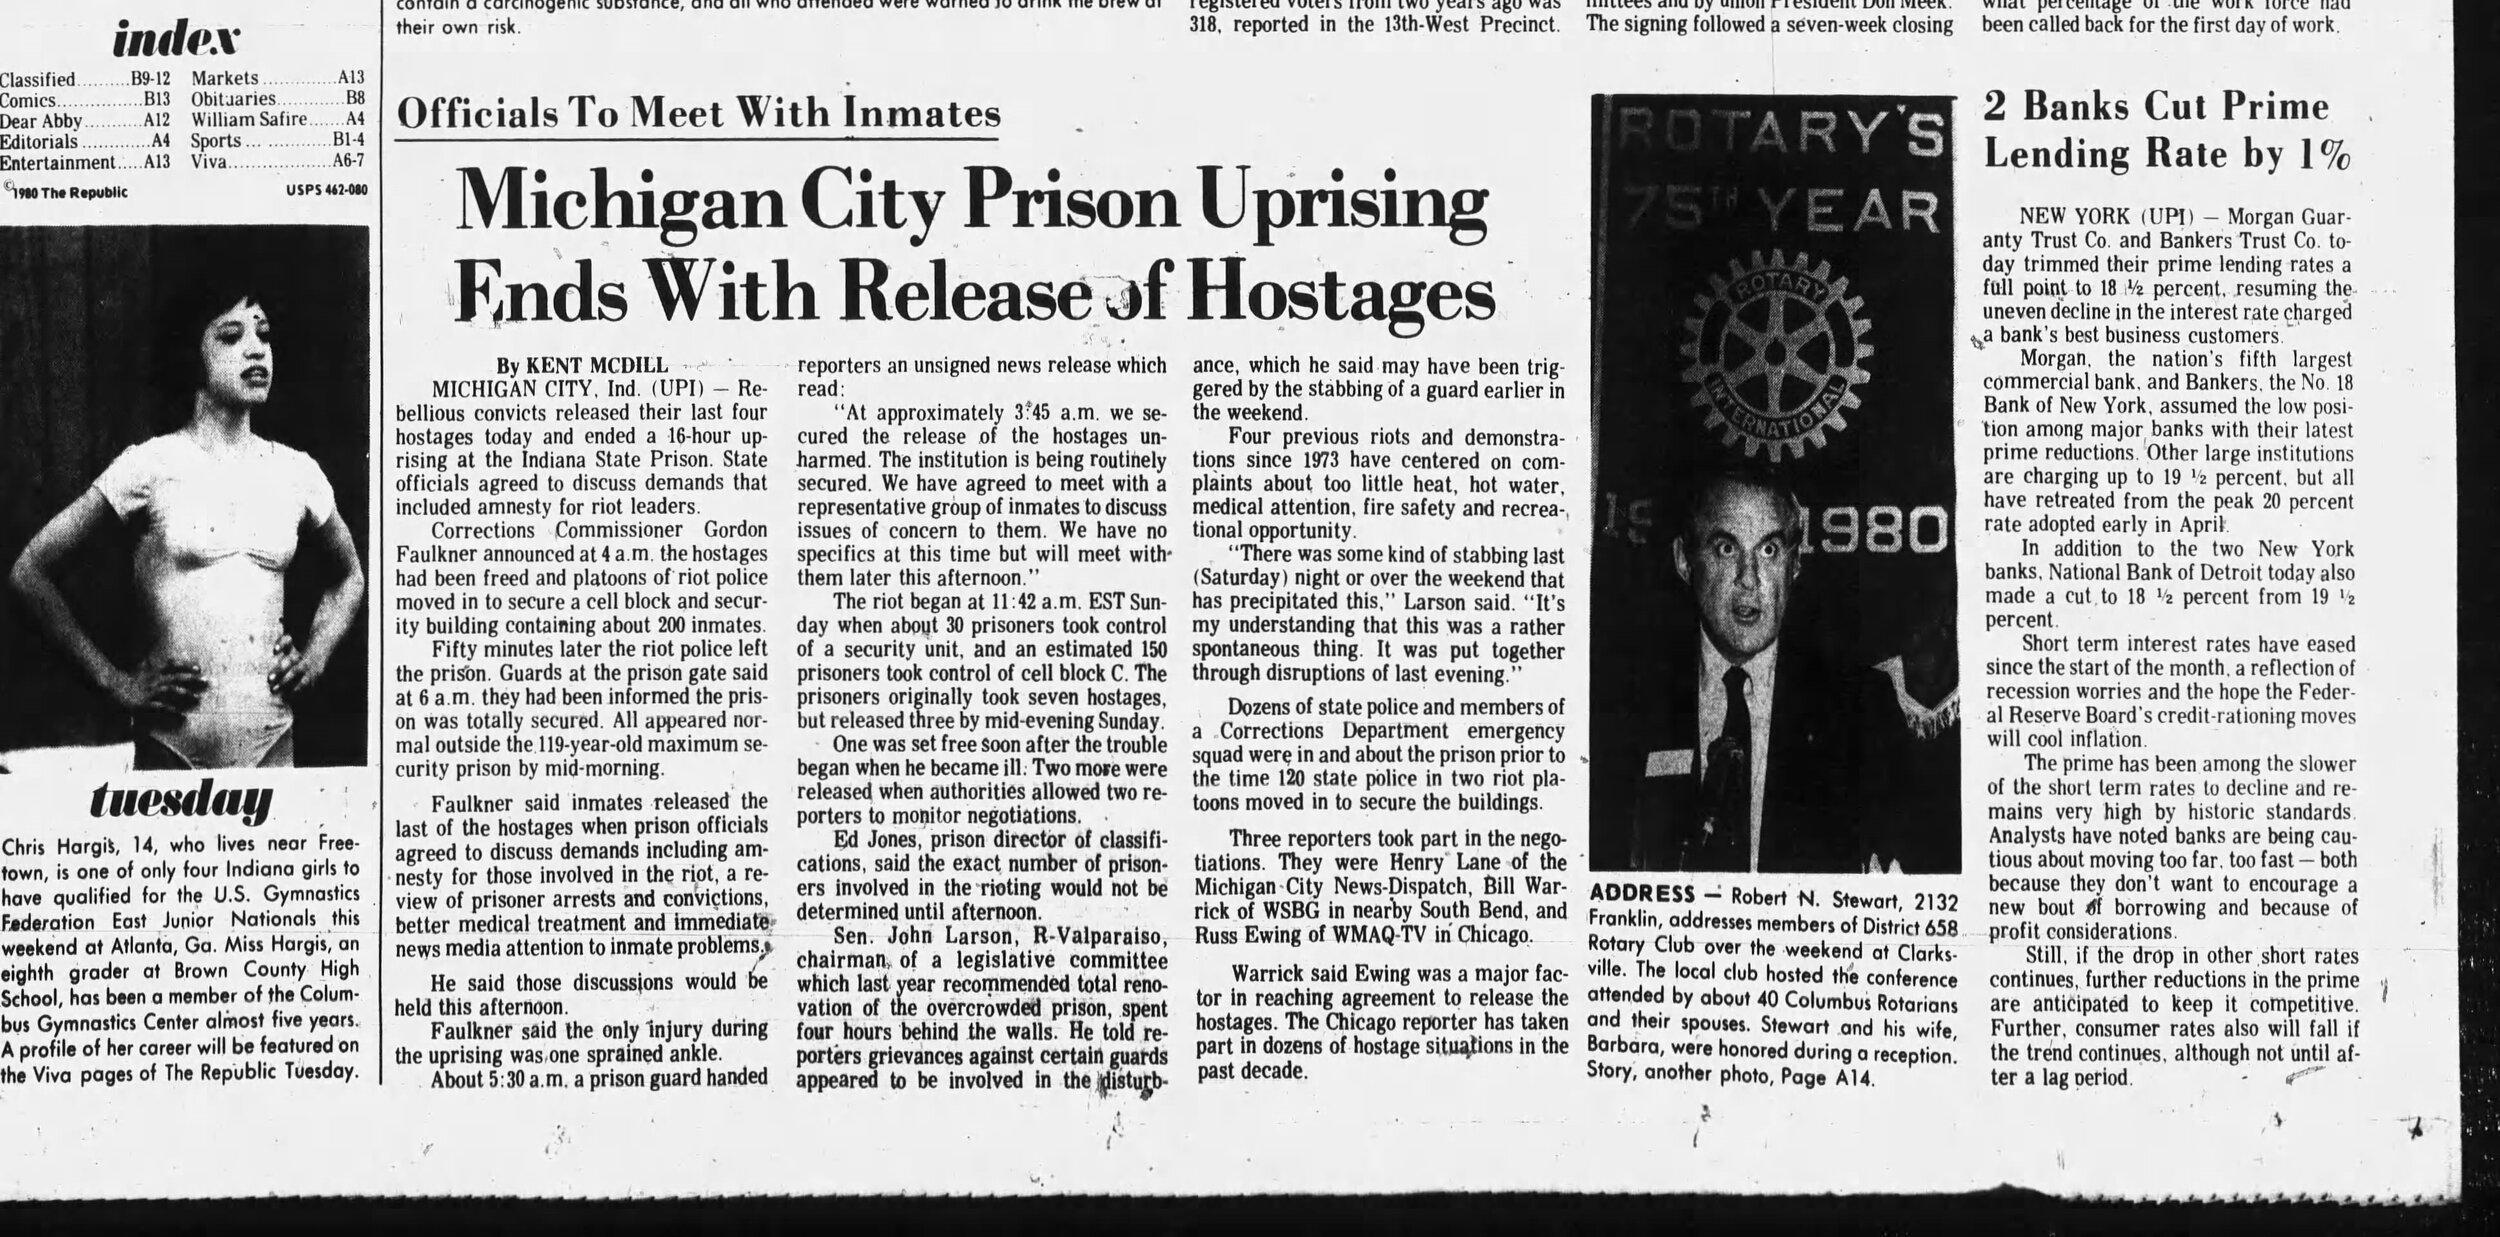 The_Republic_Mon__Apr_28__1980_1.jpg